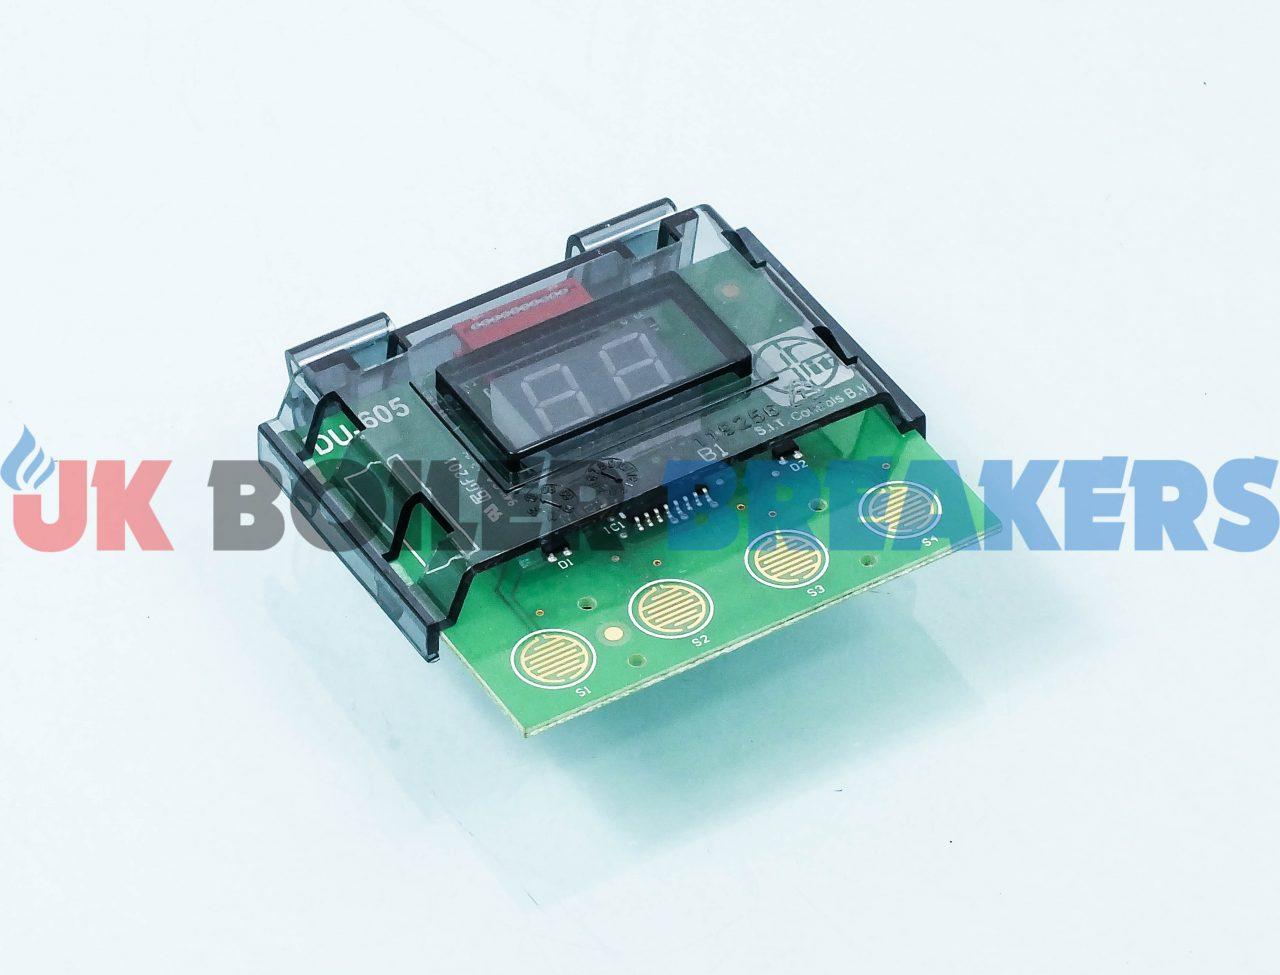 Baxi Display PCB S62739 GC- 47-075-74A